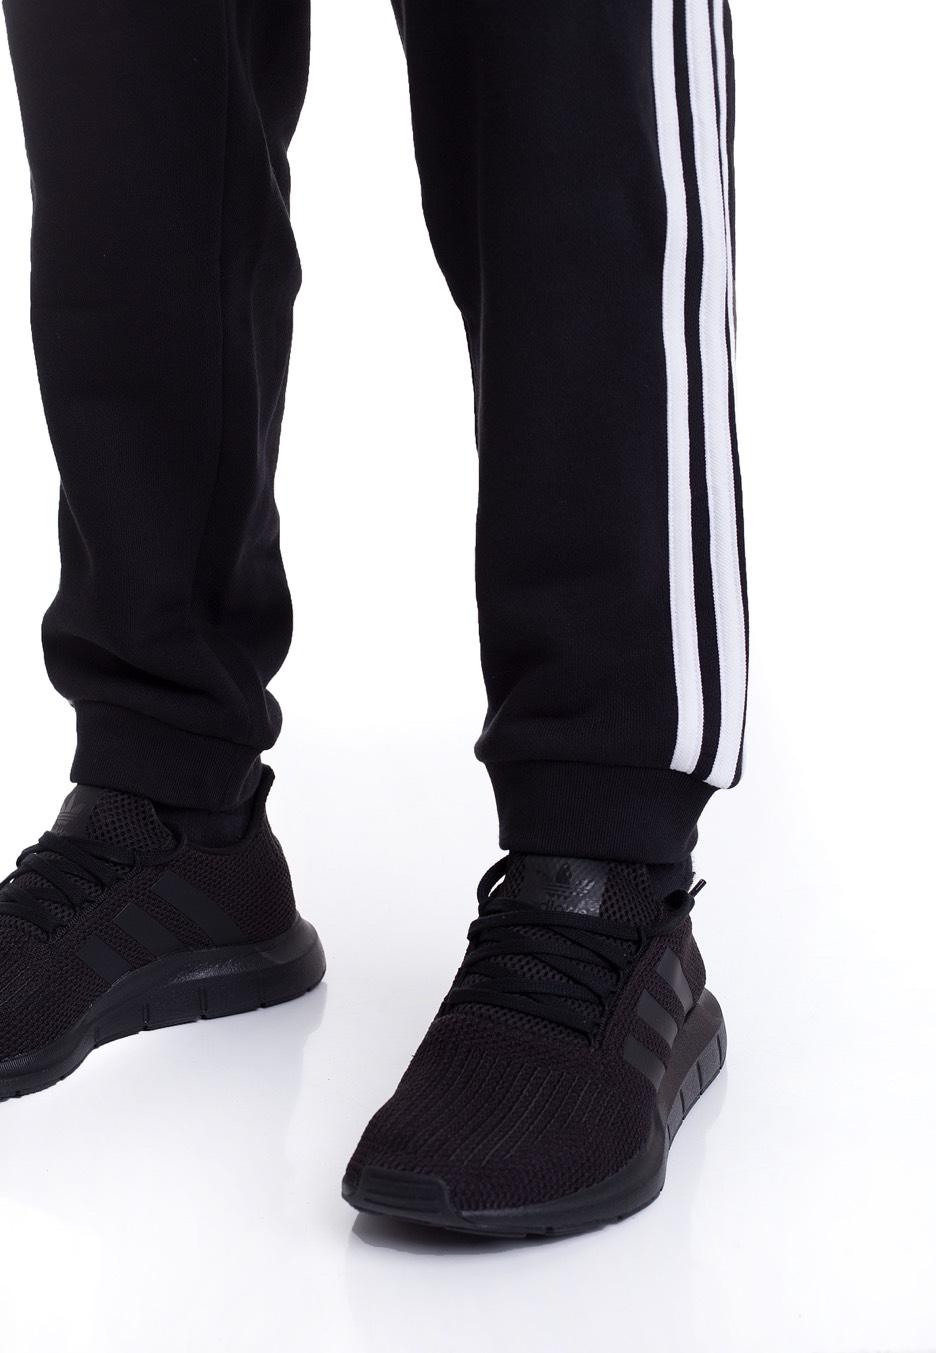 Boutique 3 Impericon Jogging Streetwear Stripes Adidas Black wUpzqw4